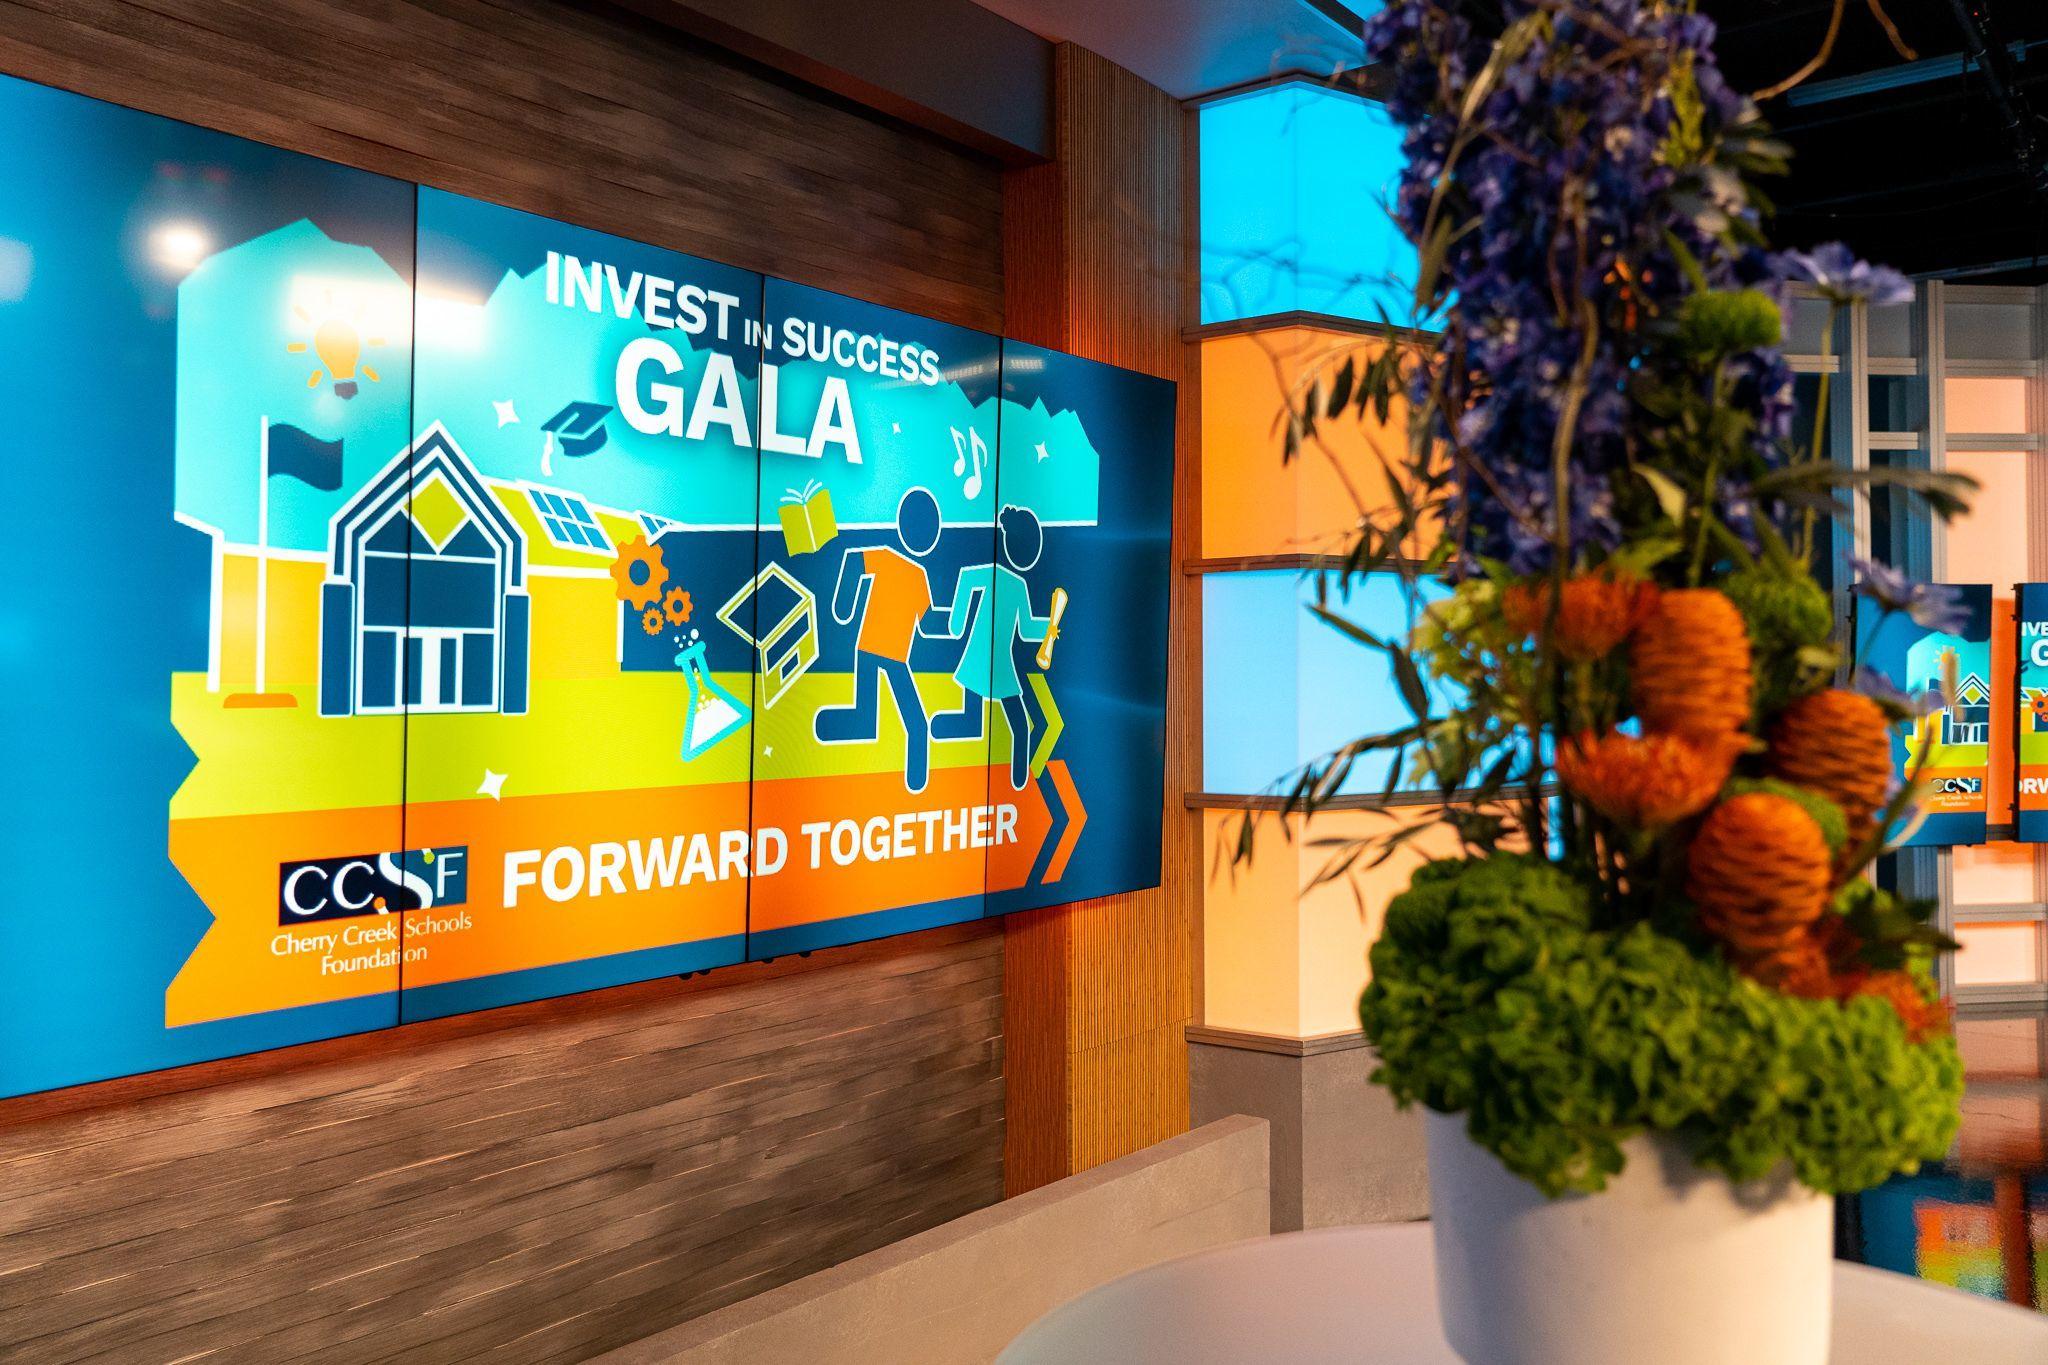 7th Annual Invest in Success Gala